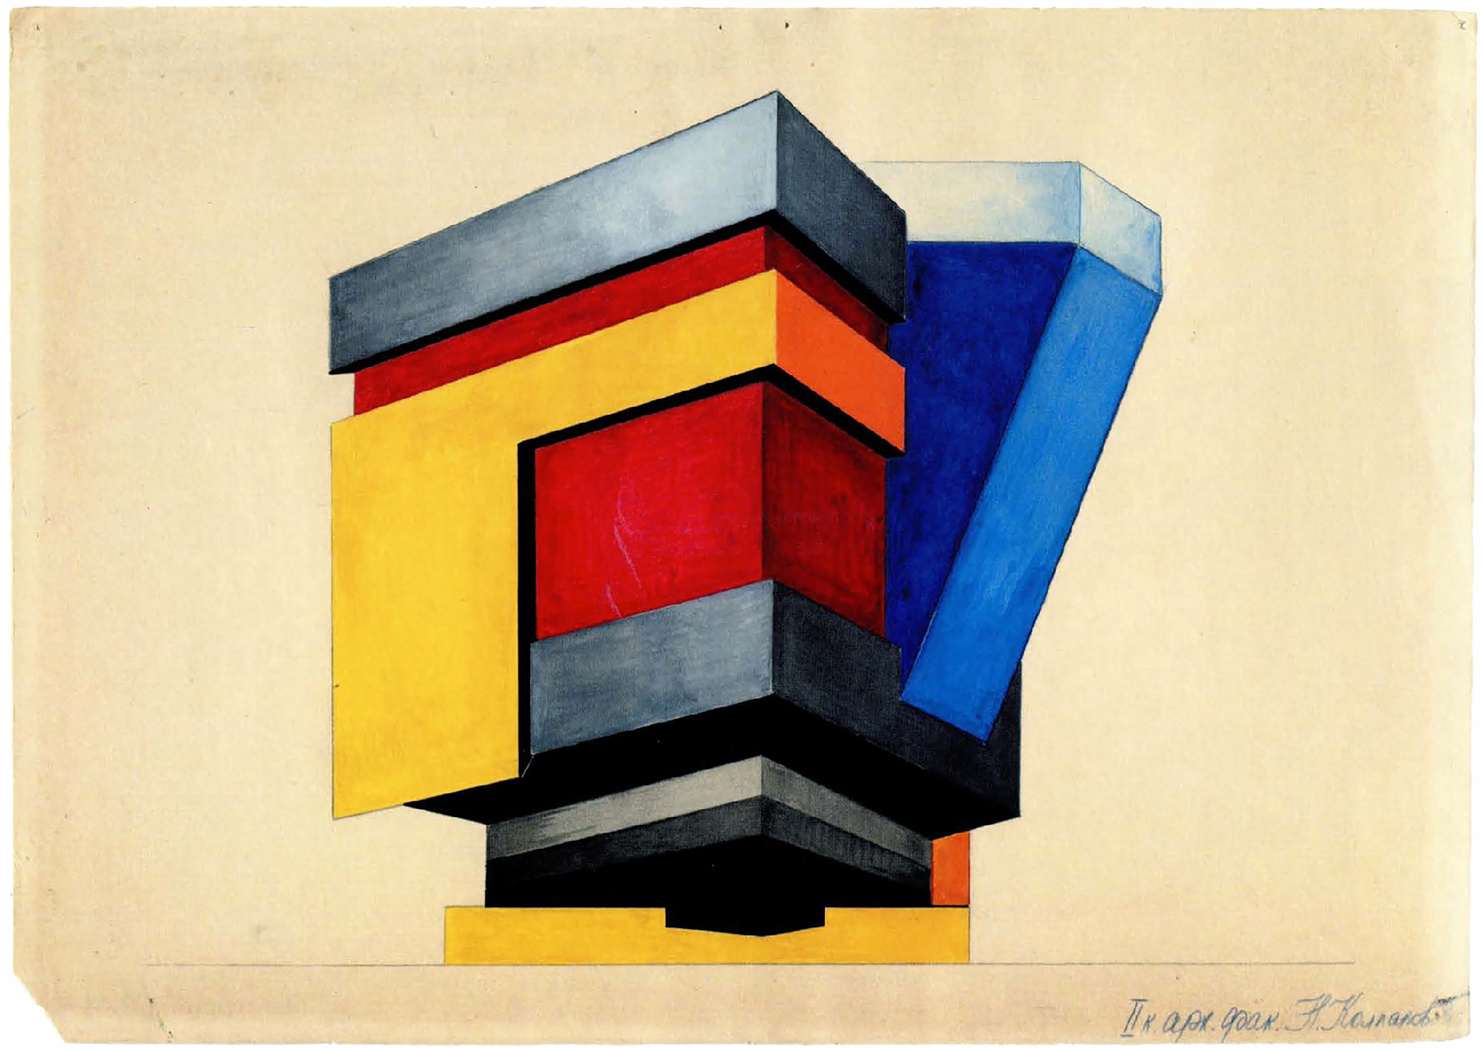 V Kolpakova, G Klutsis' workshop, color solution for the facades of an architectural volume, 1928-1929